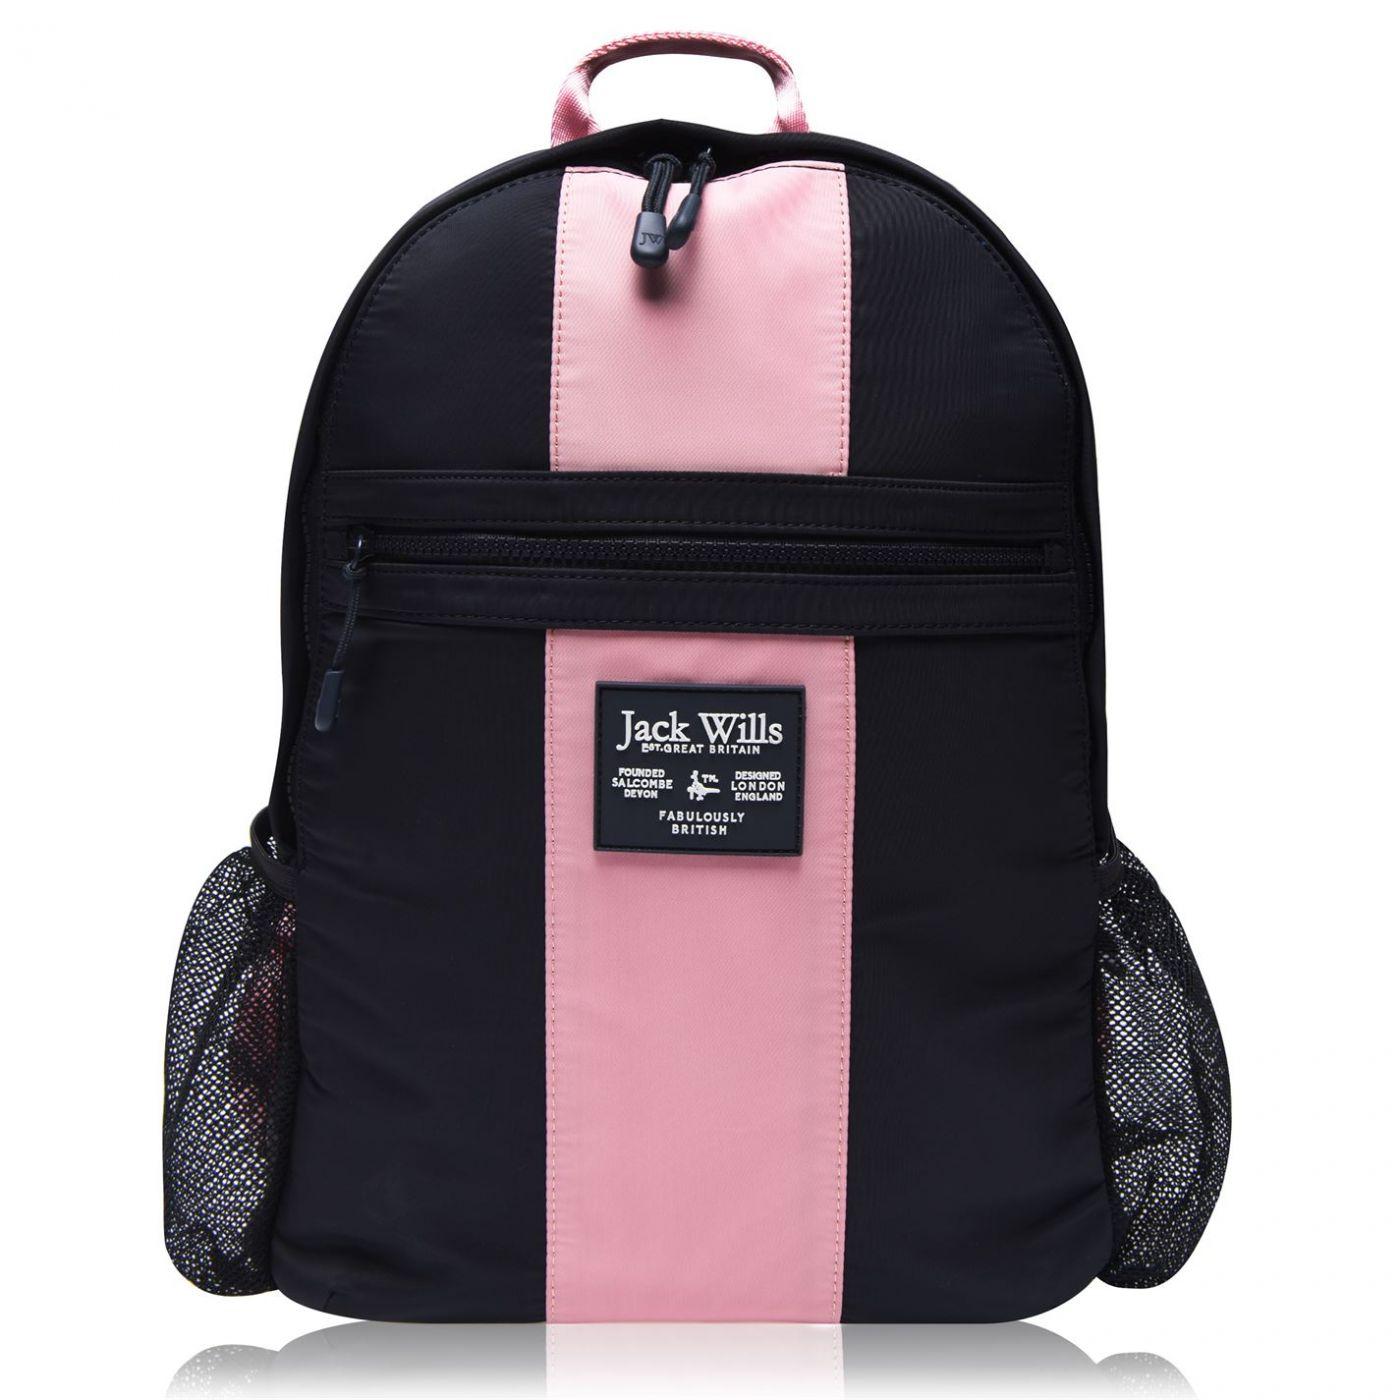 Jack Wills Portbury Backpack